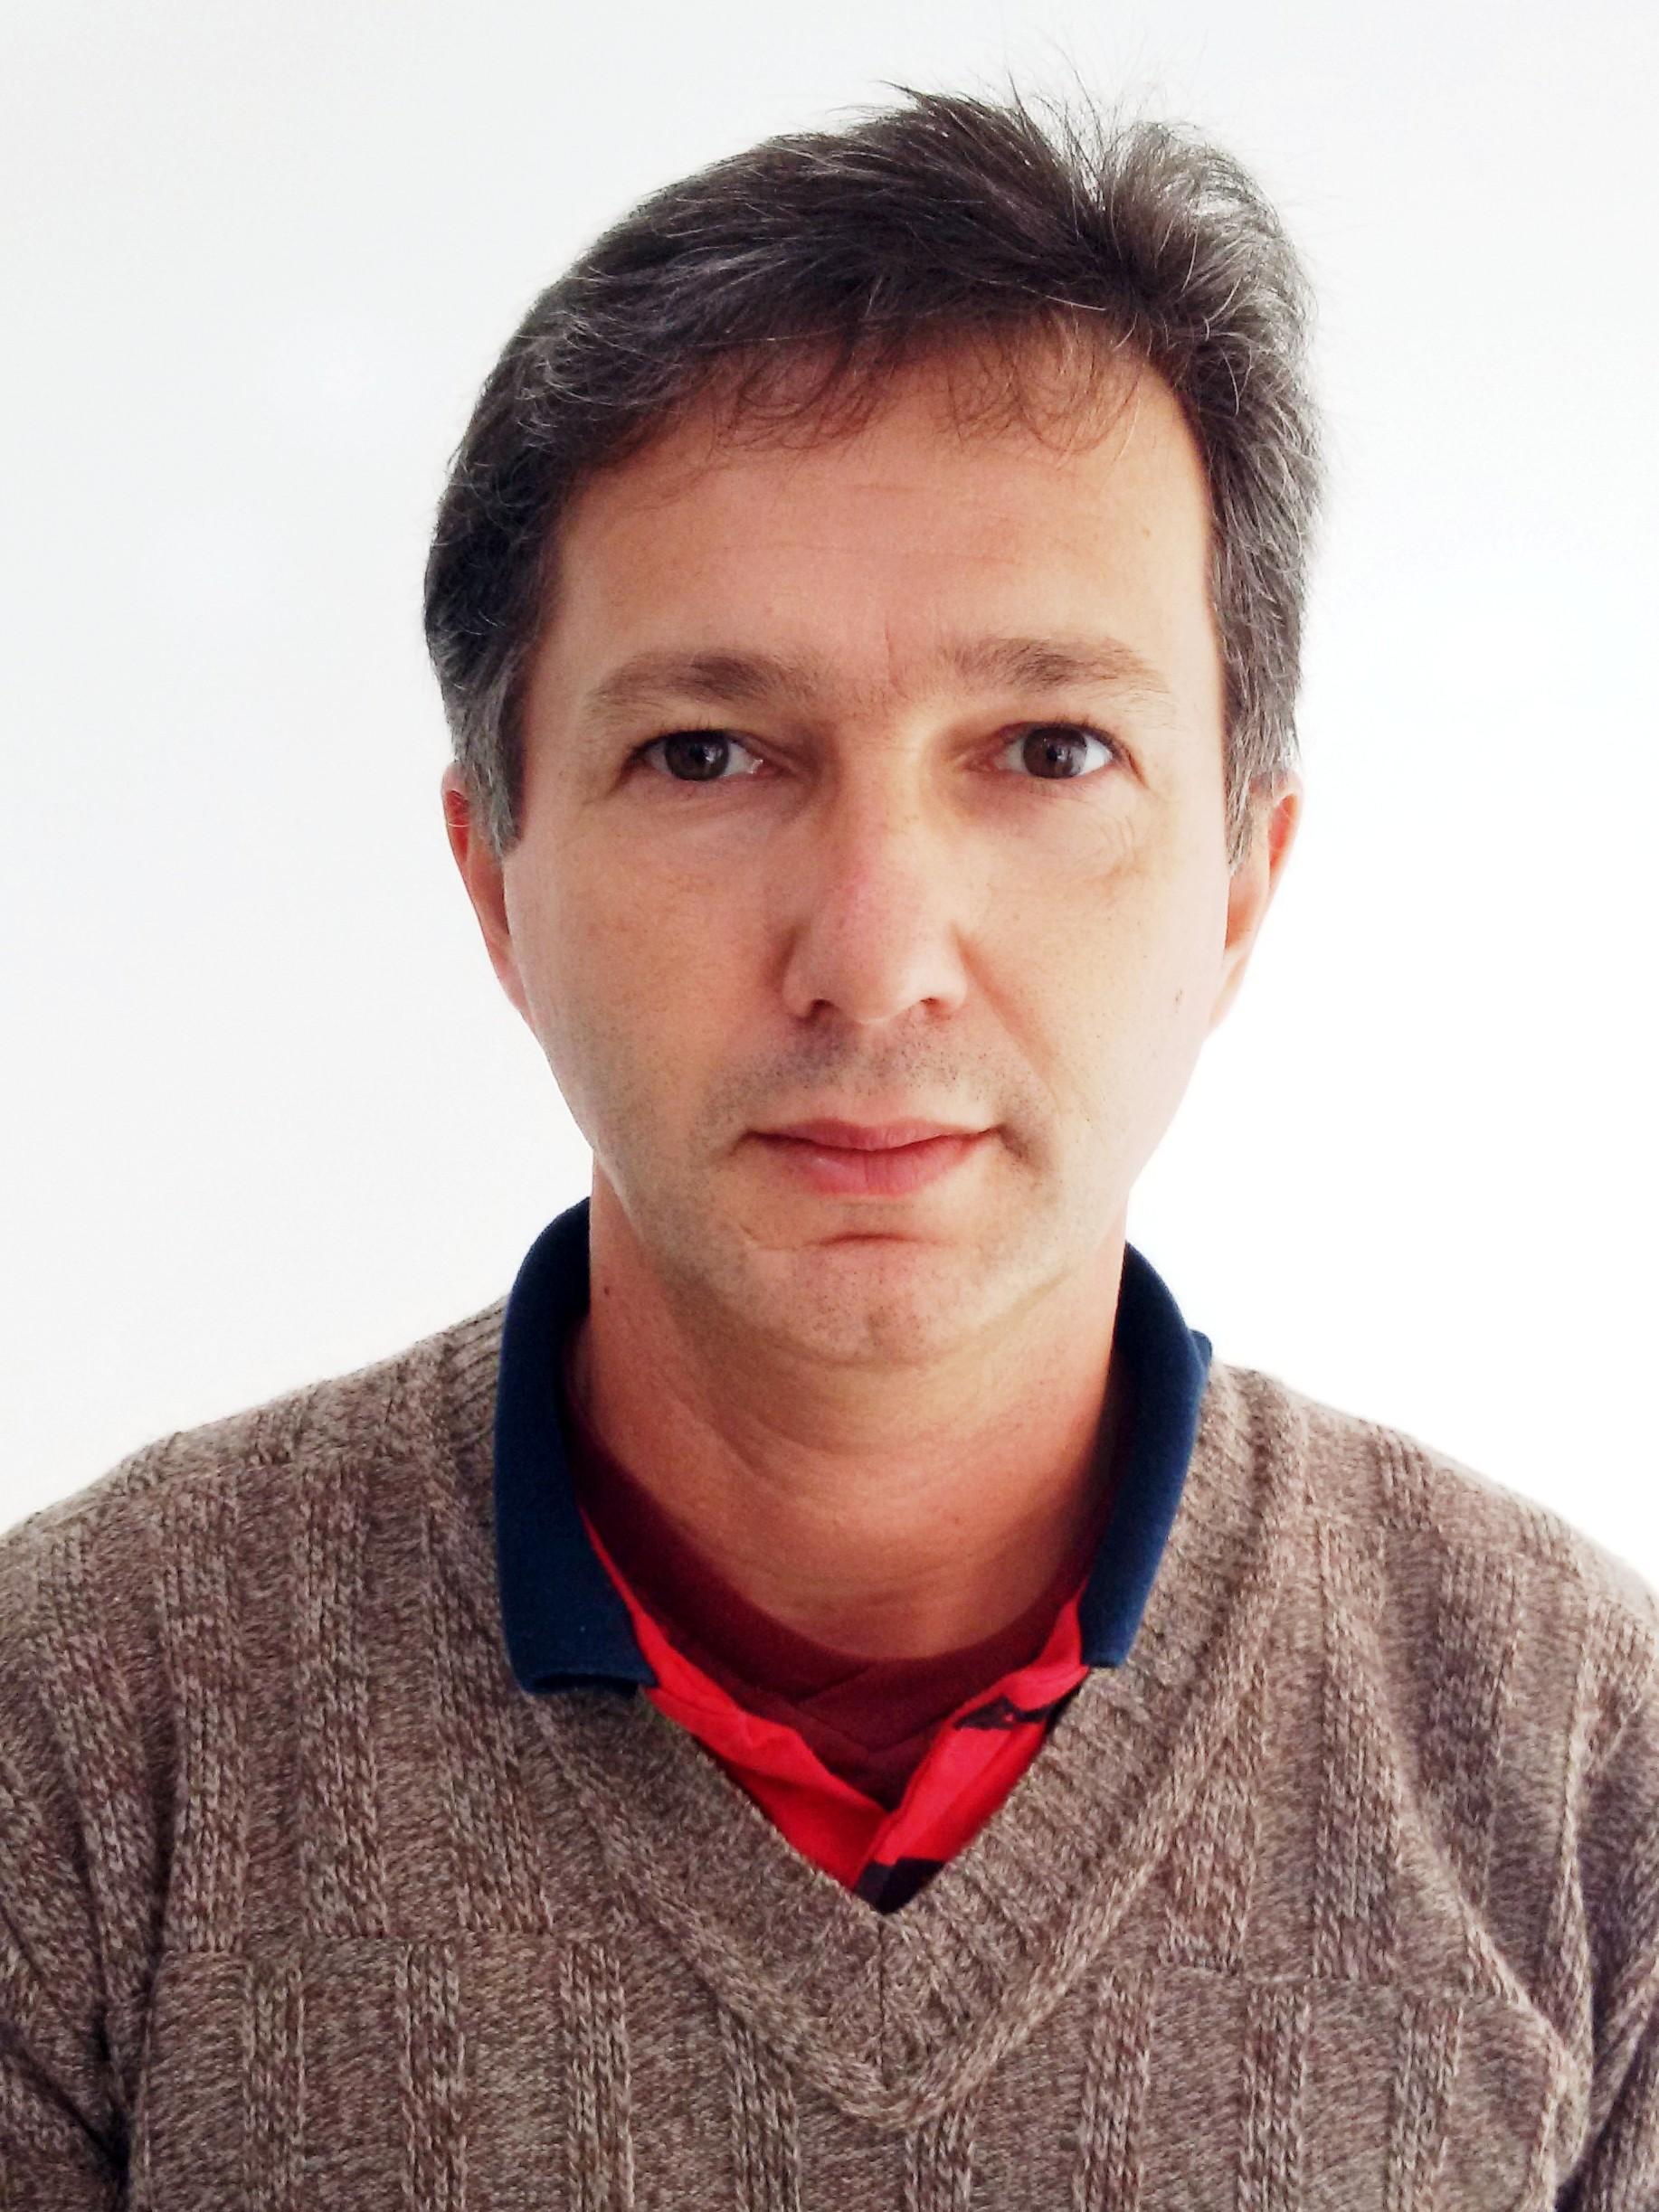 Ronaldo Medeiros Ferreira